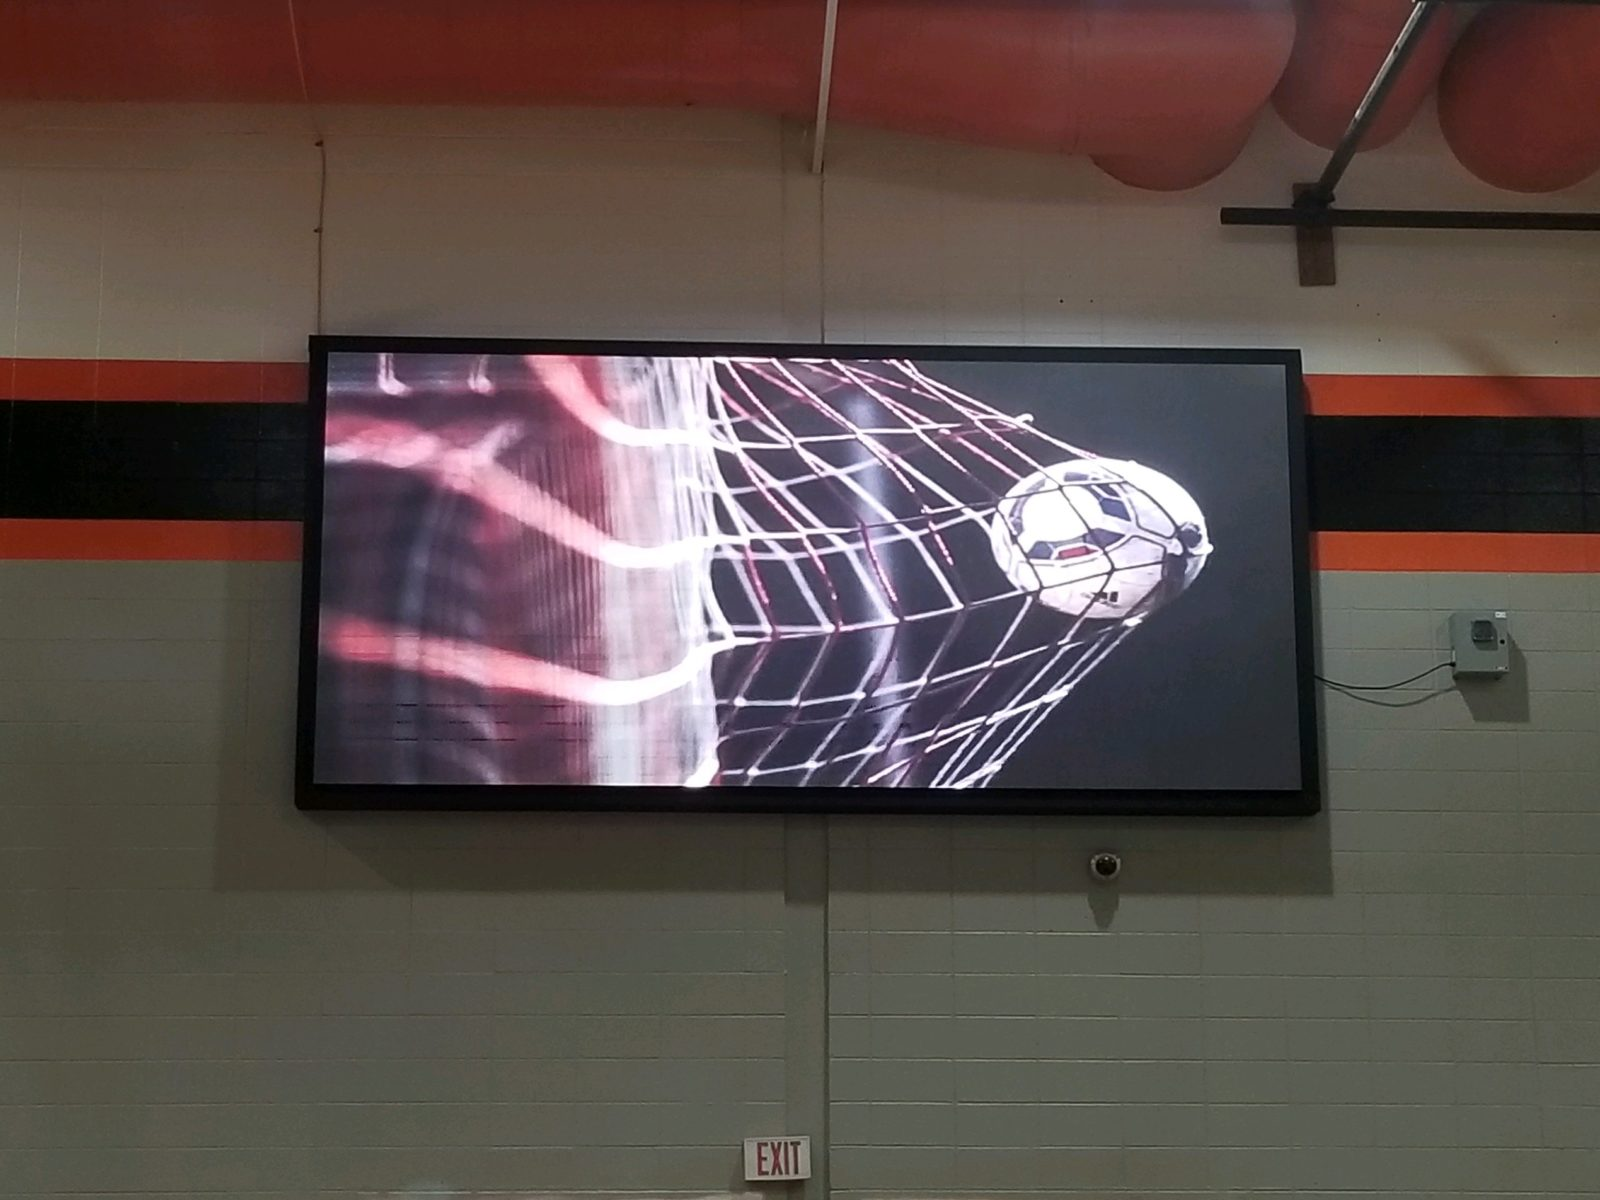 An Indoor LED scoreboard.